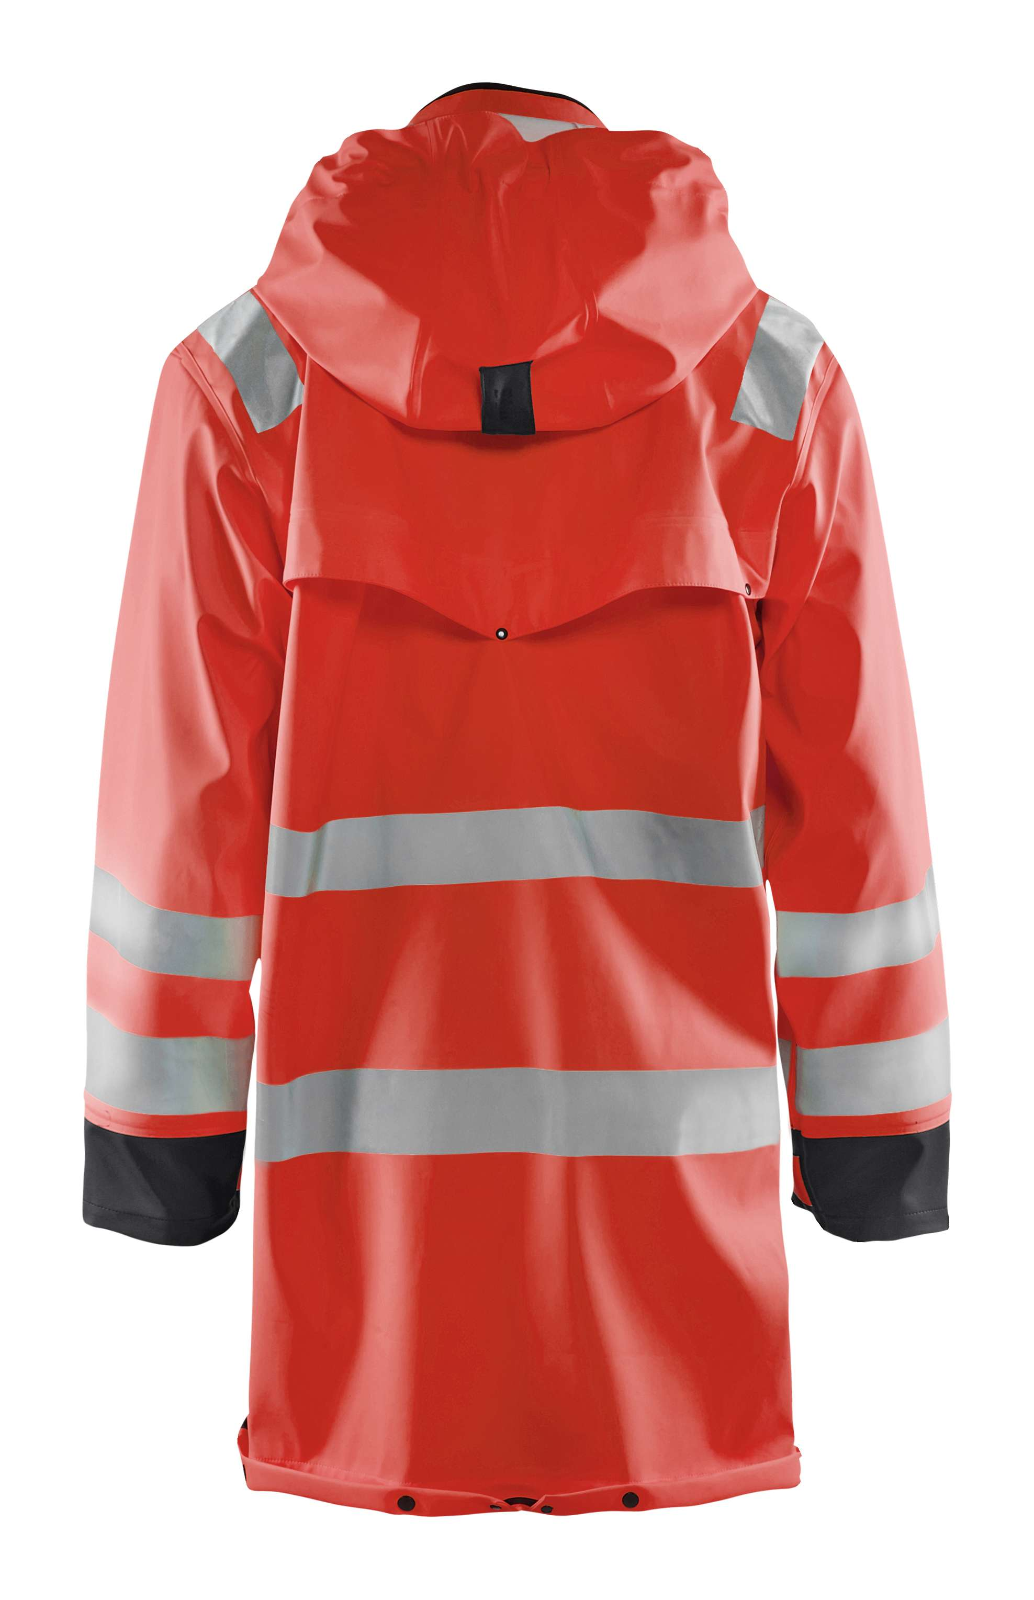 Blaklader Regenjassen 43062003 High Vis fluor rood-zwart(5599)